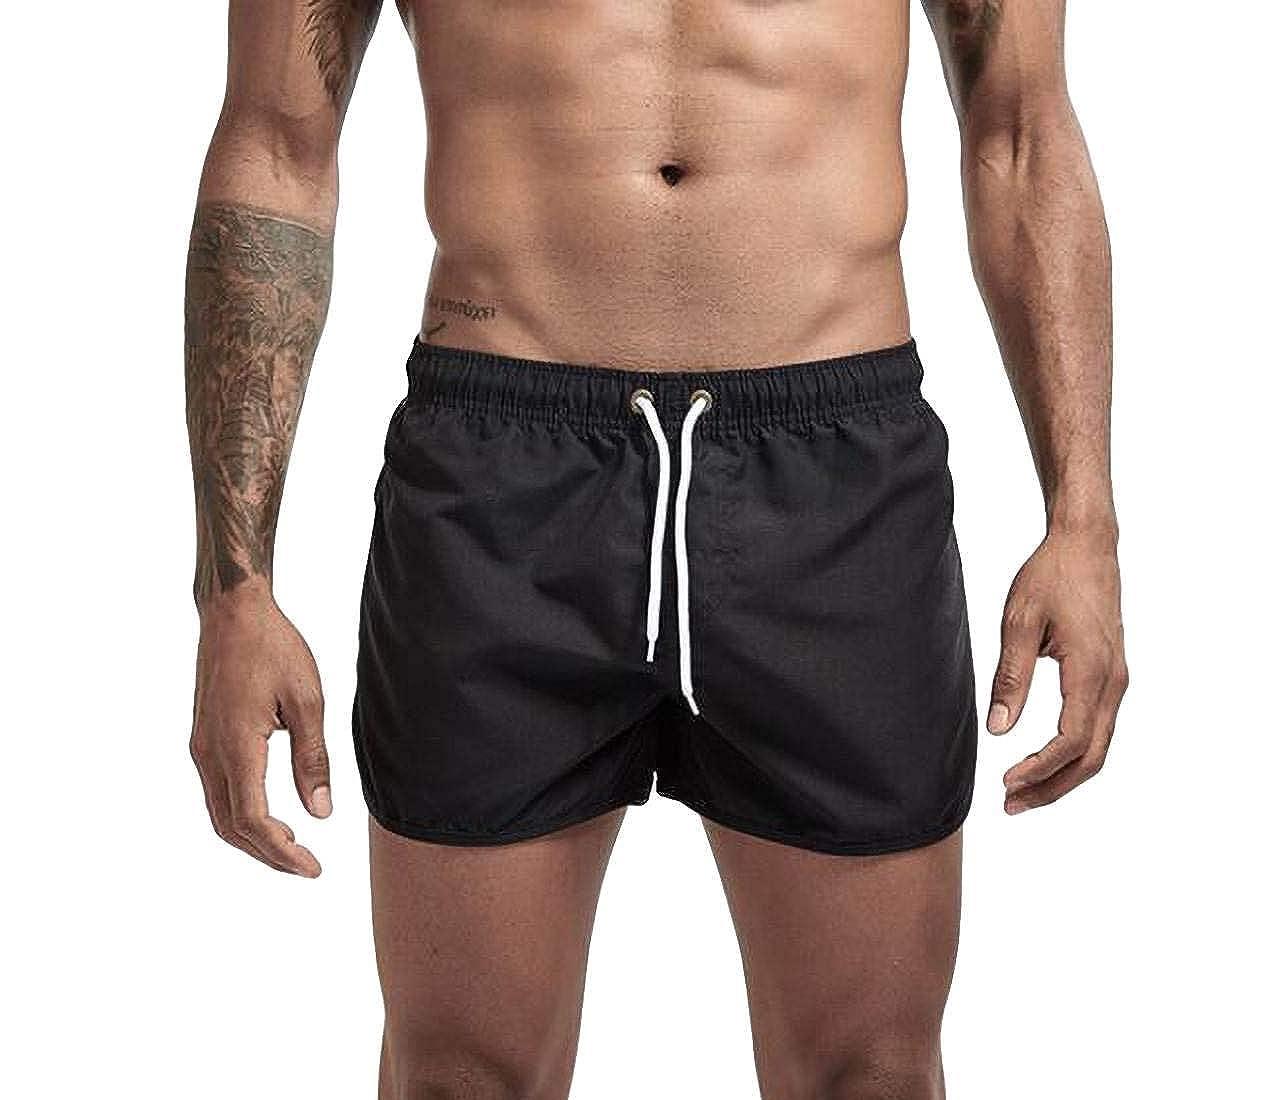 Zantt Men Solid Drawstring Quick Dry Beach Sport Shorts Swim Trunk